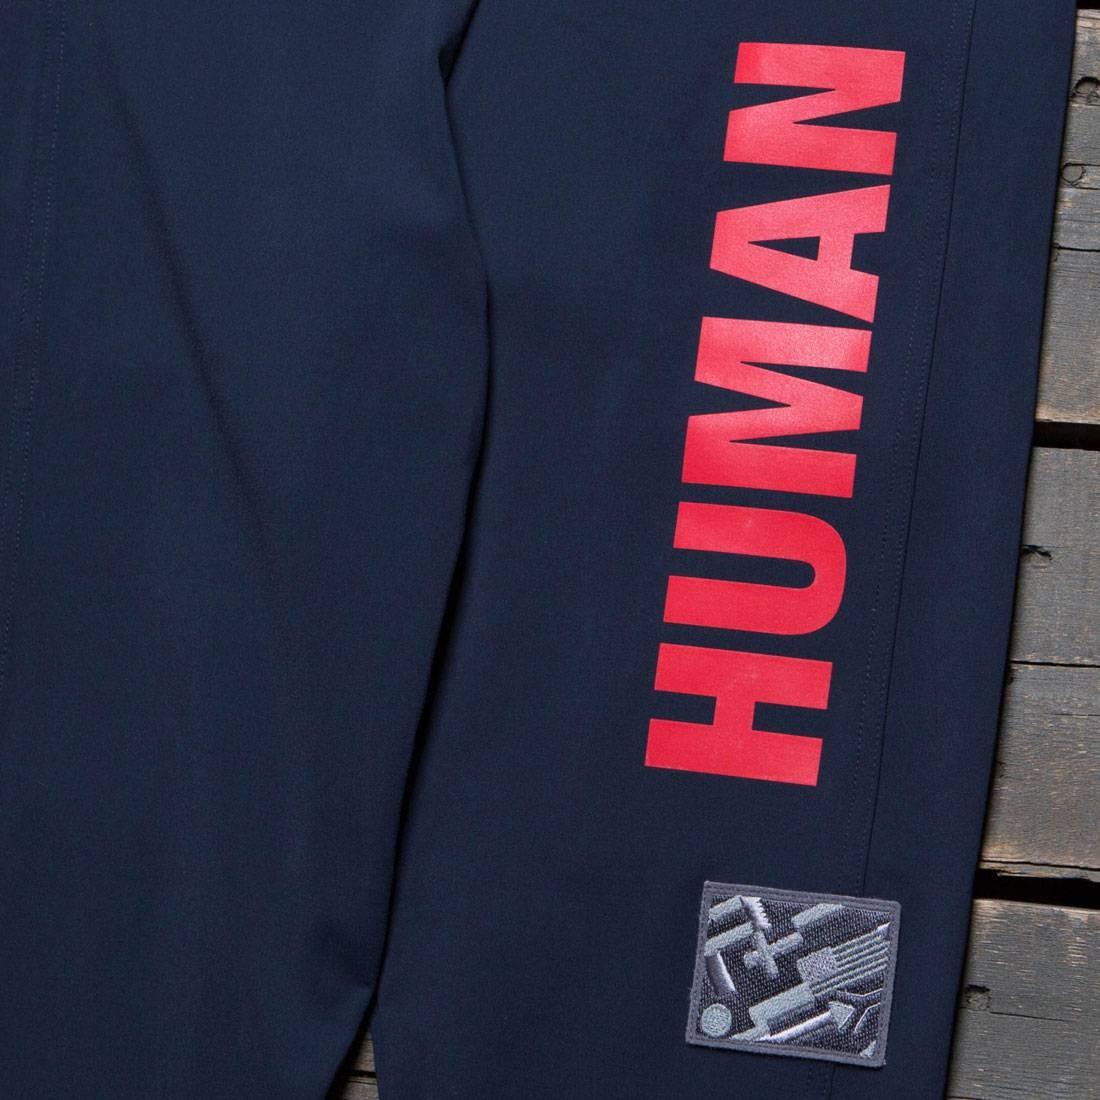 20b61a248fbdd Adidas x Pharrell Williams Women Hu Race Leggings (navy / night marine /  scarlet)